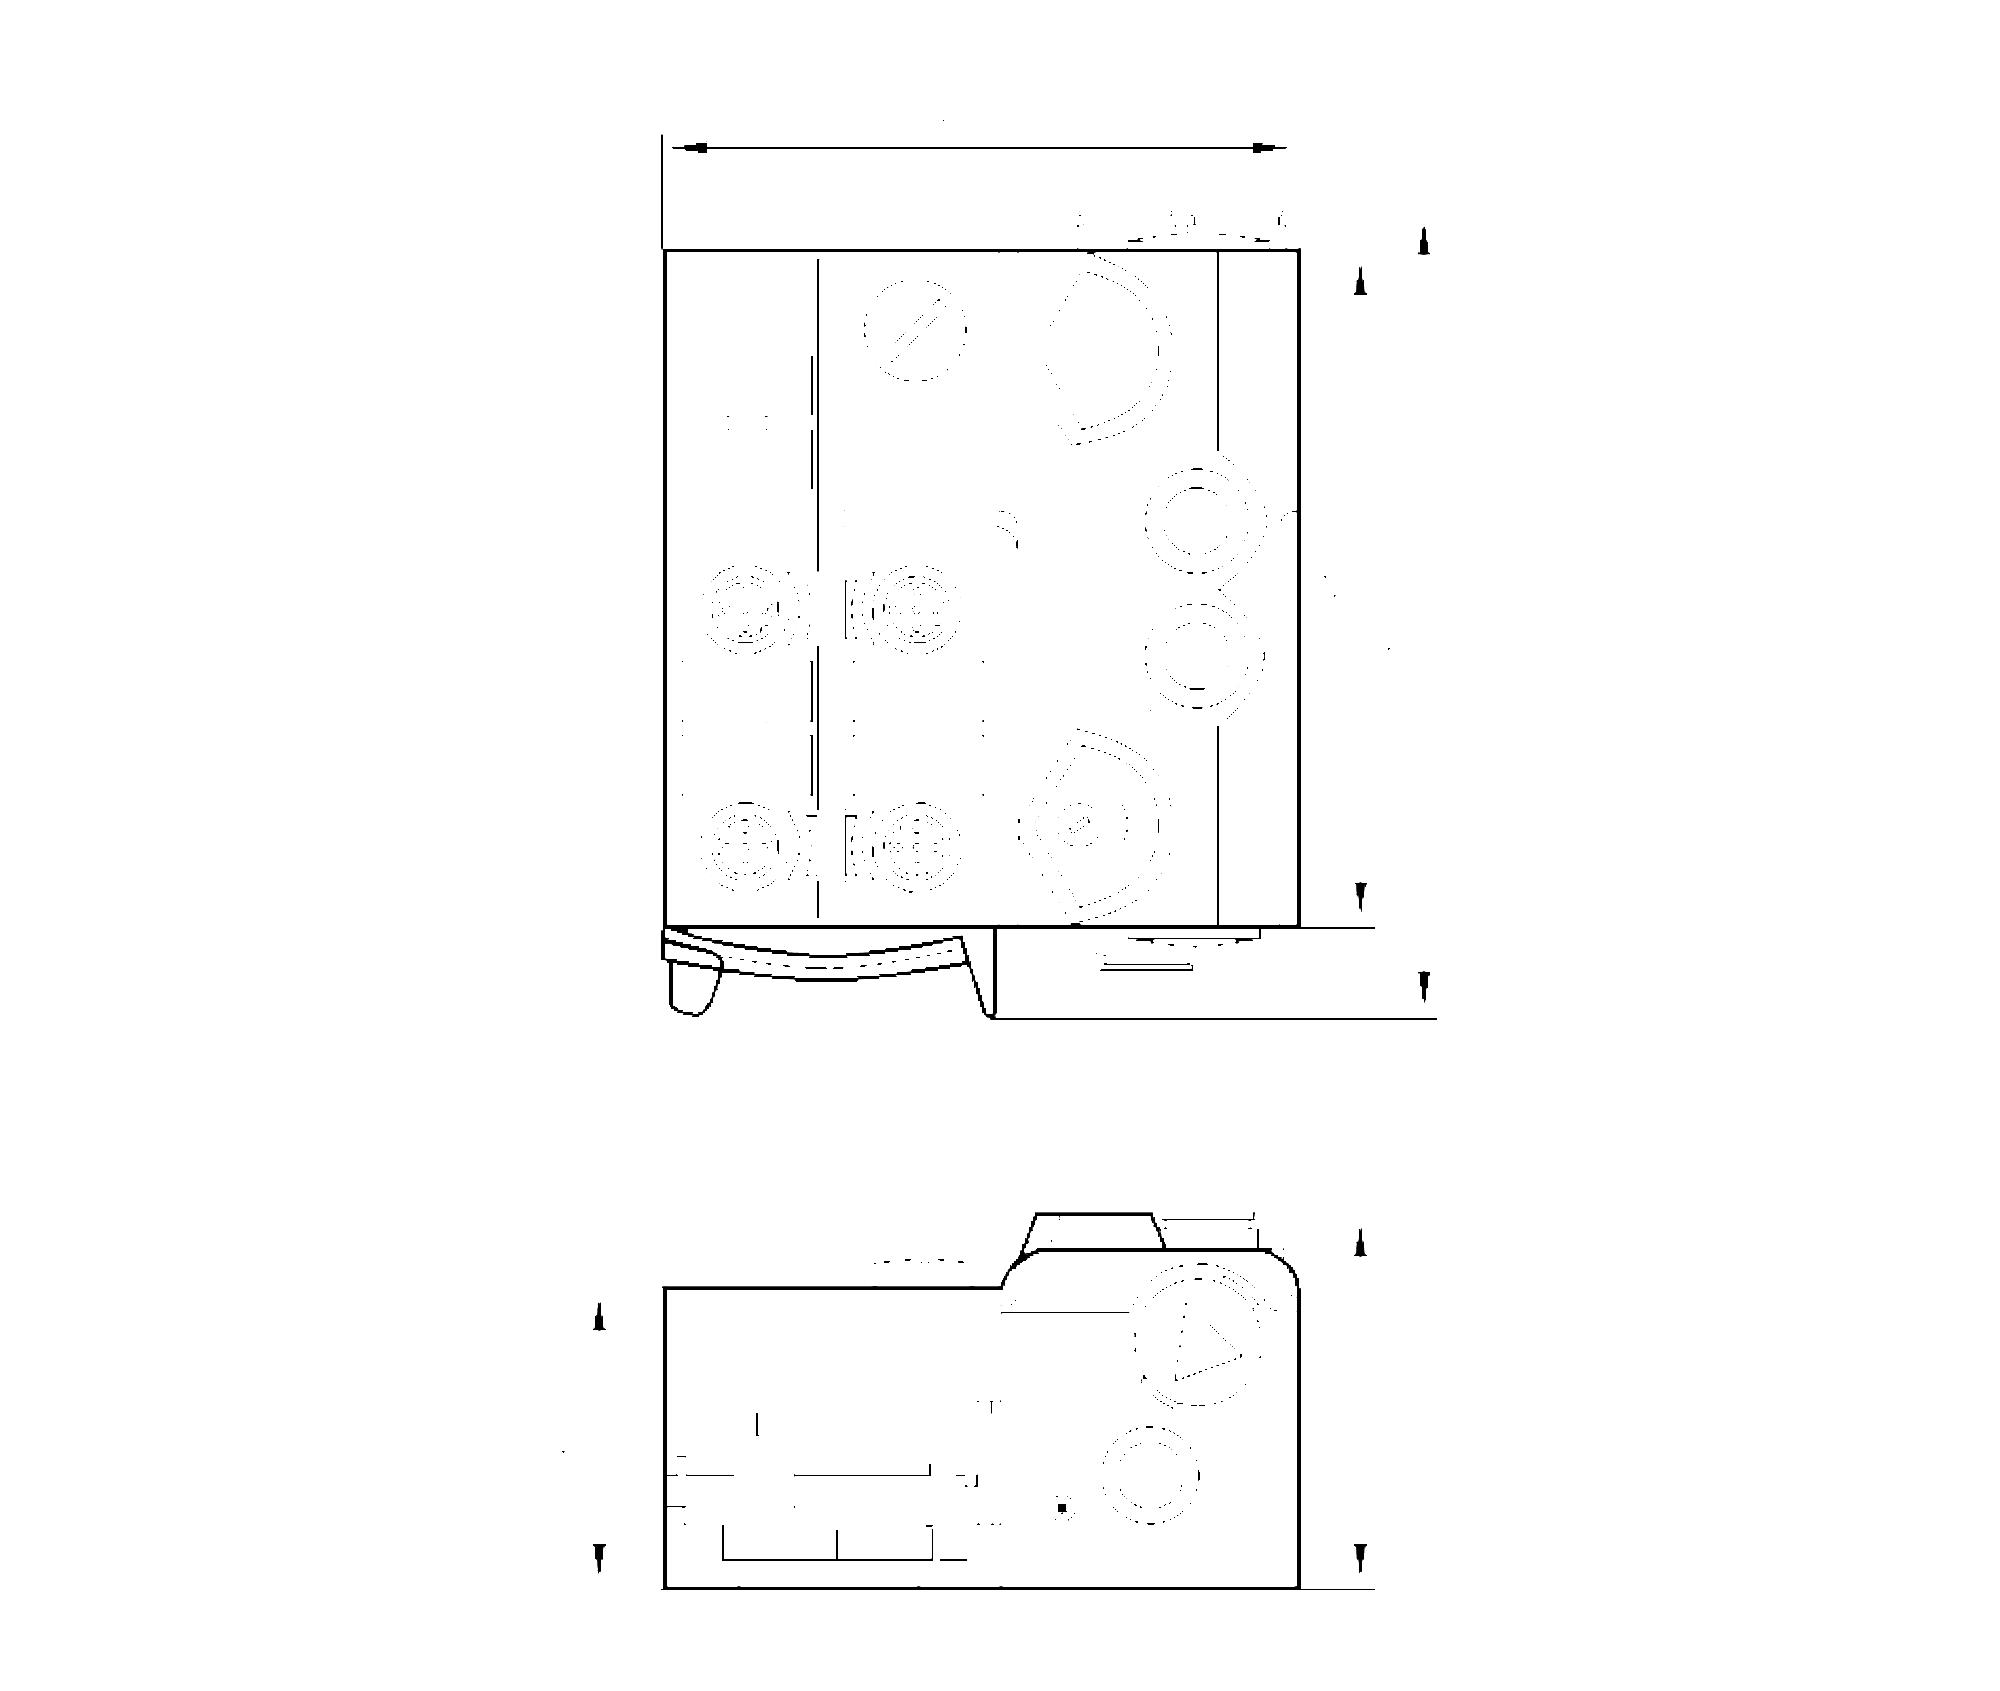 ac5246